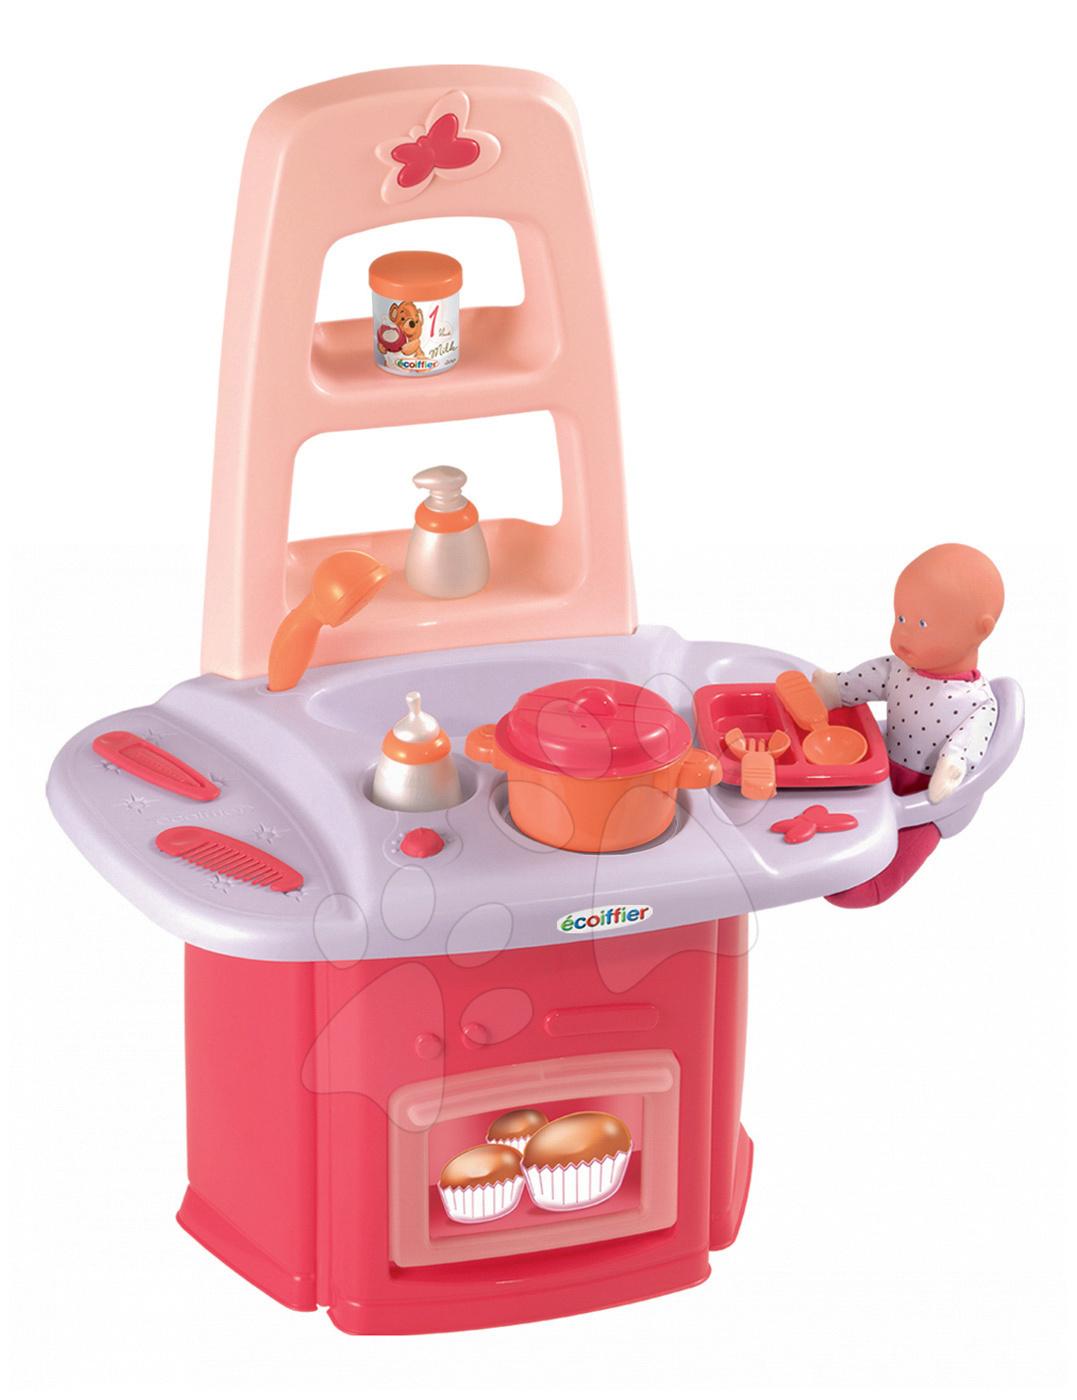 Previjalna mizica za dojenčka Nursery Écoiffier s kuhinjo s 14 dodatki od 18 mes